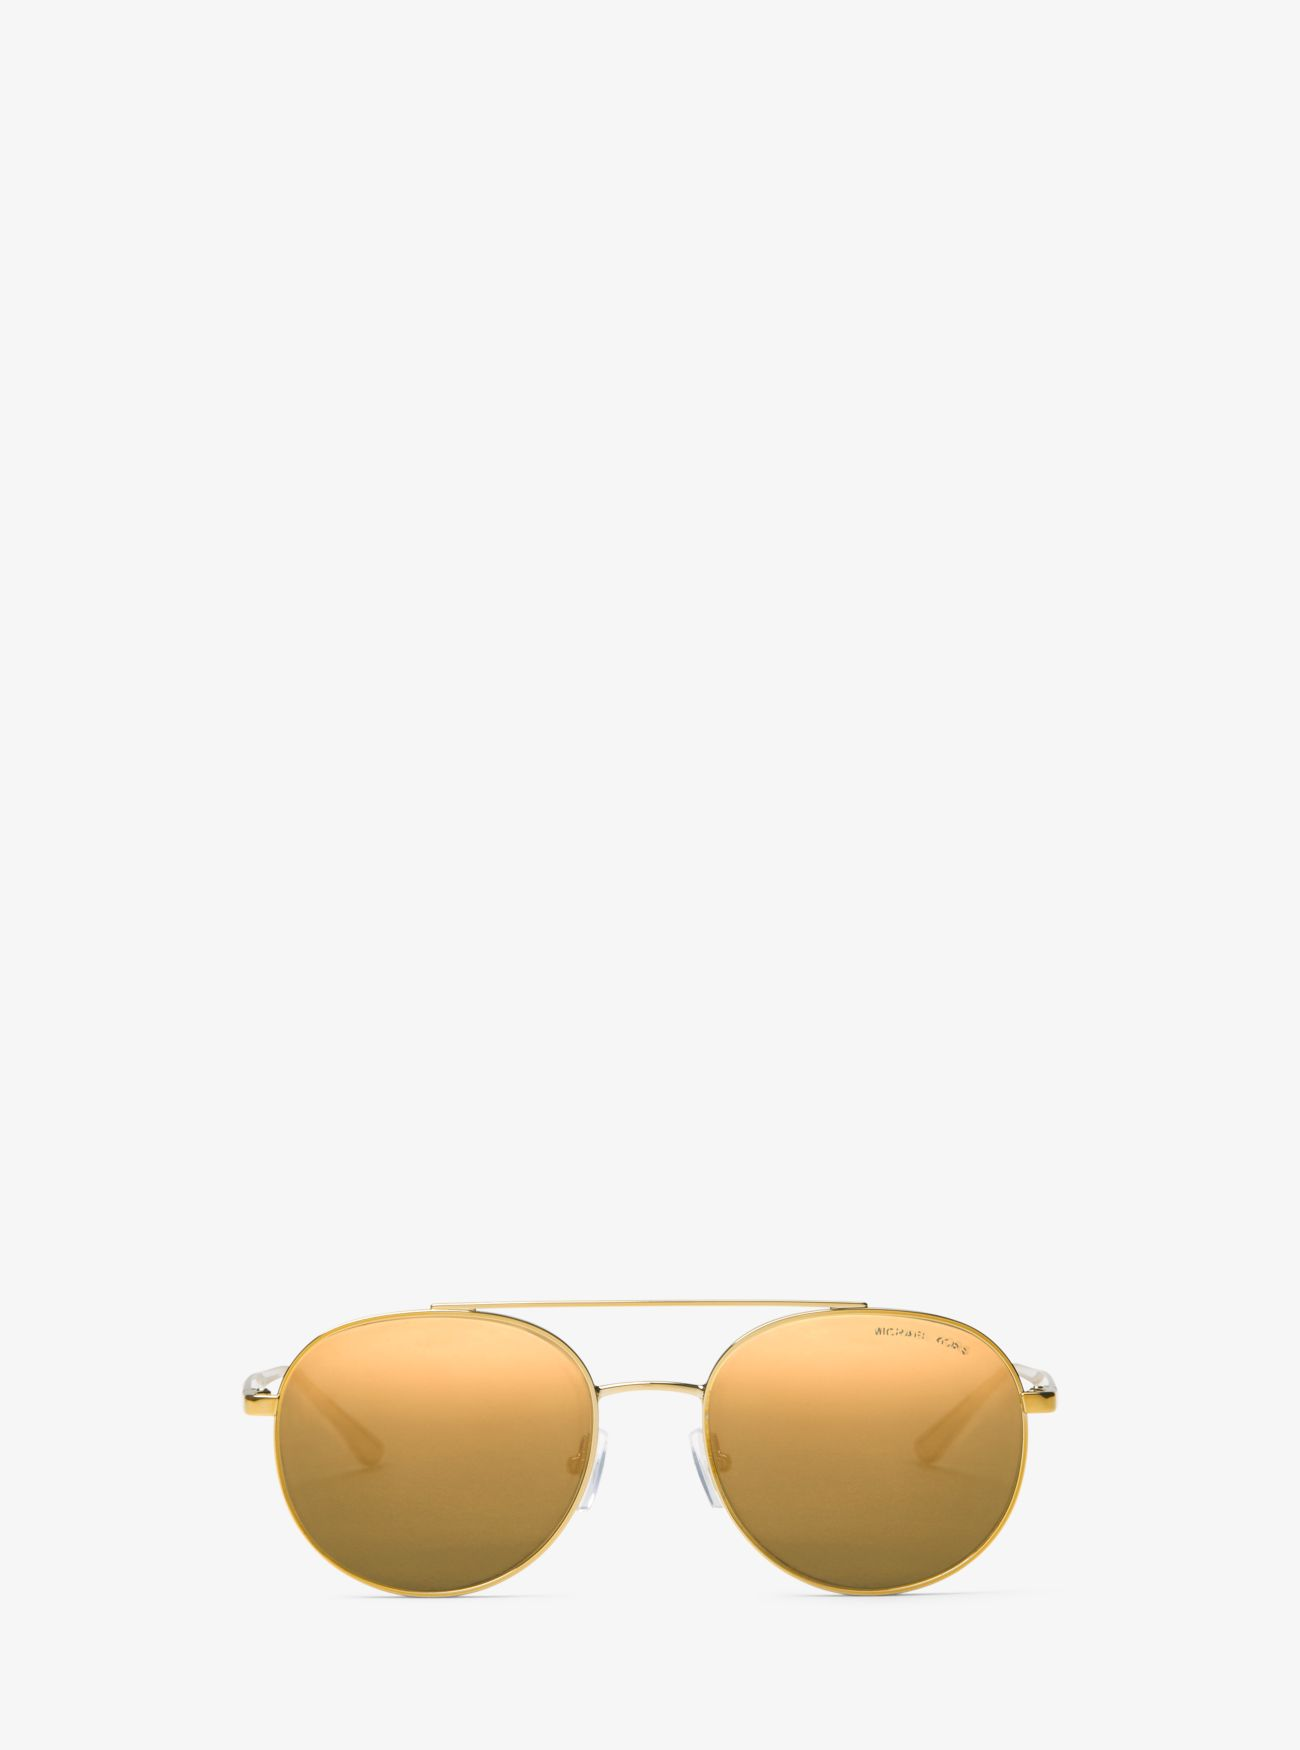 59047e17c Lon Rounded Aviator Sunglasses Lon Rounded Aviator Sunglasses. Michael Kors